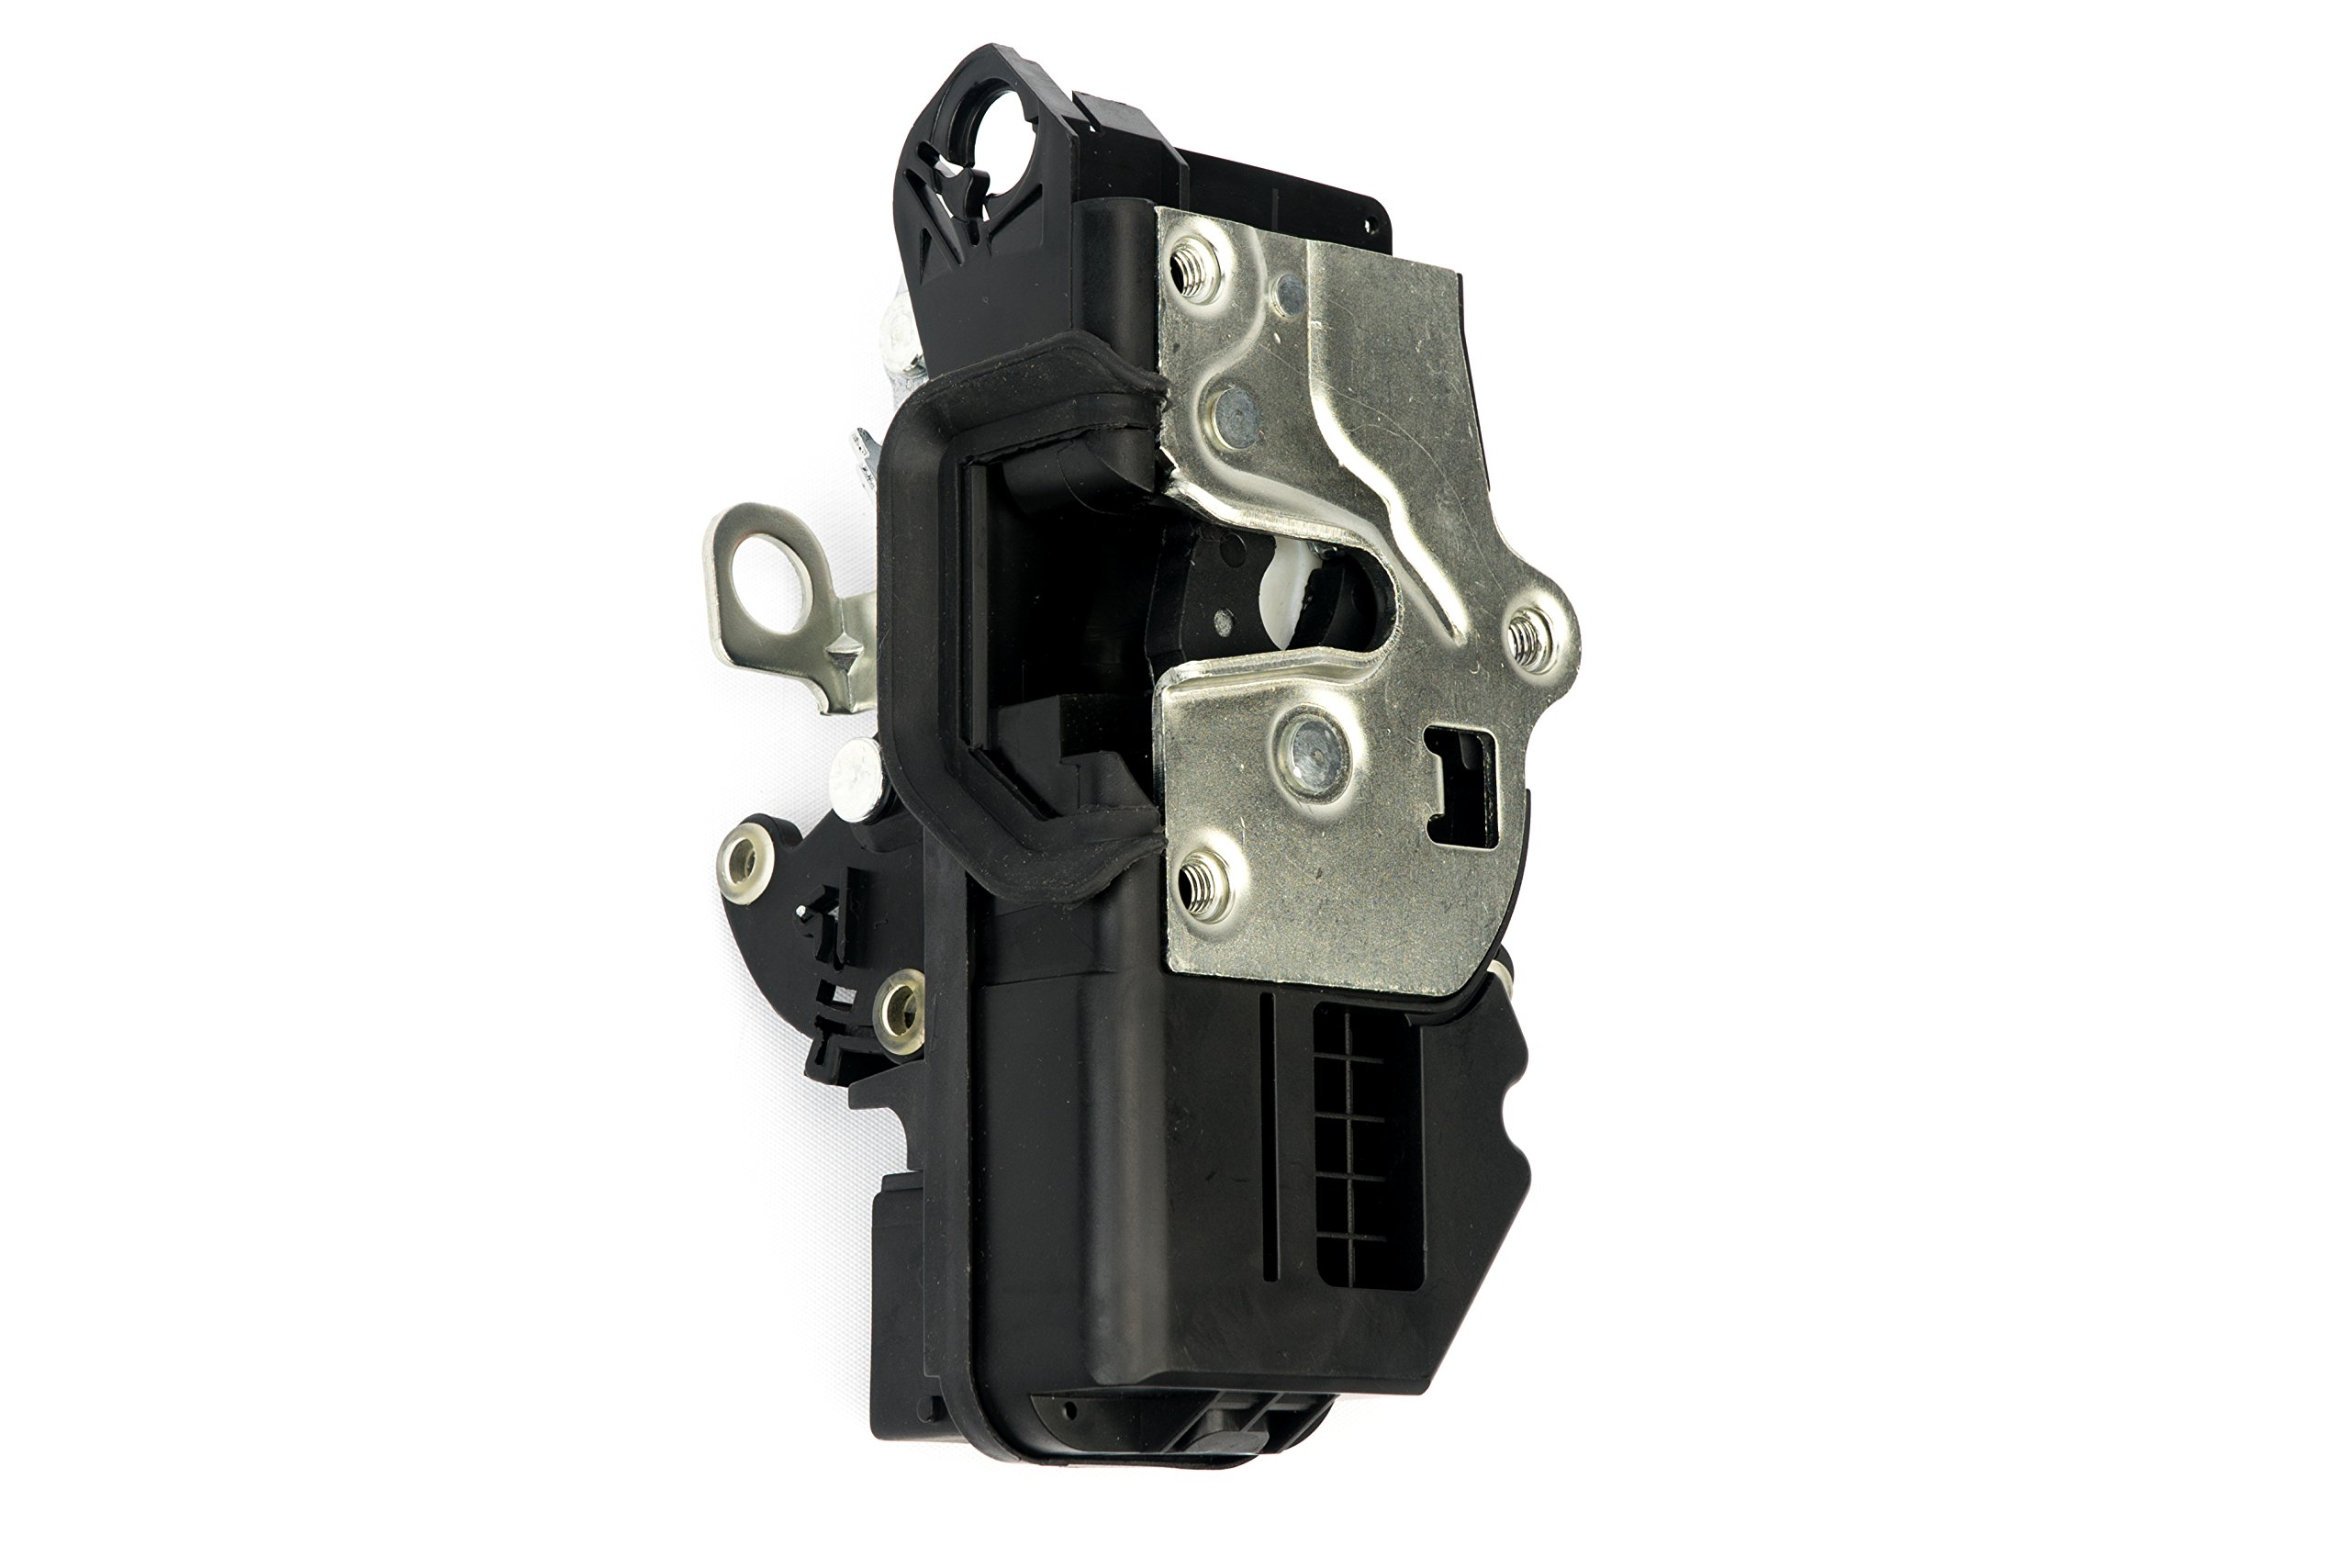 Door Latch Lock Actuator Motor - Front Left Driver Side - Replaces# 15880052, 207838846, 25789211, 931-303 - Fits 2007, 2008, 2009 Chevy Tahoe, Silverado, Cadillac Escalade, GMC Sierra, Yukon & more